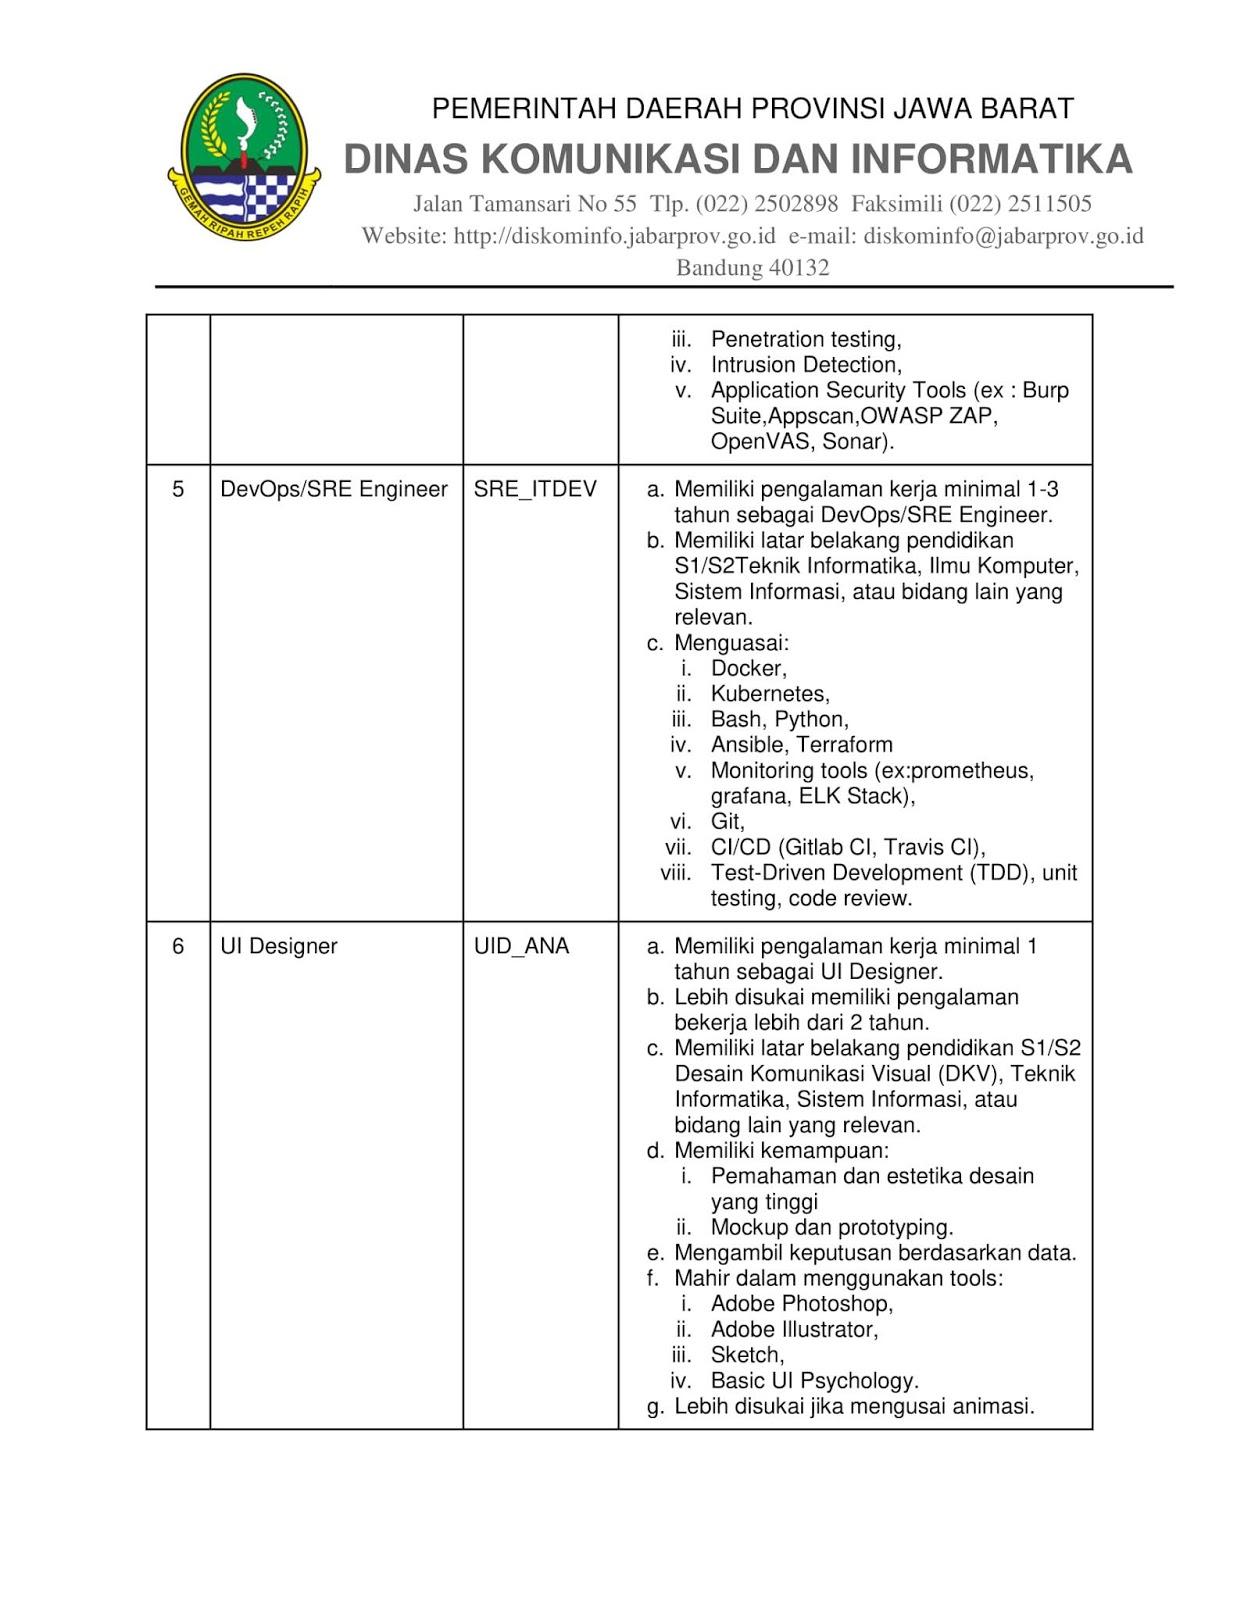 Lowongan Kerja Dinas Komunikasi Dan Informatika Provinsi